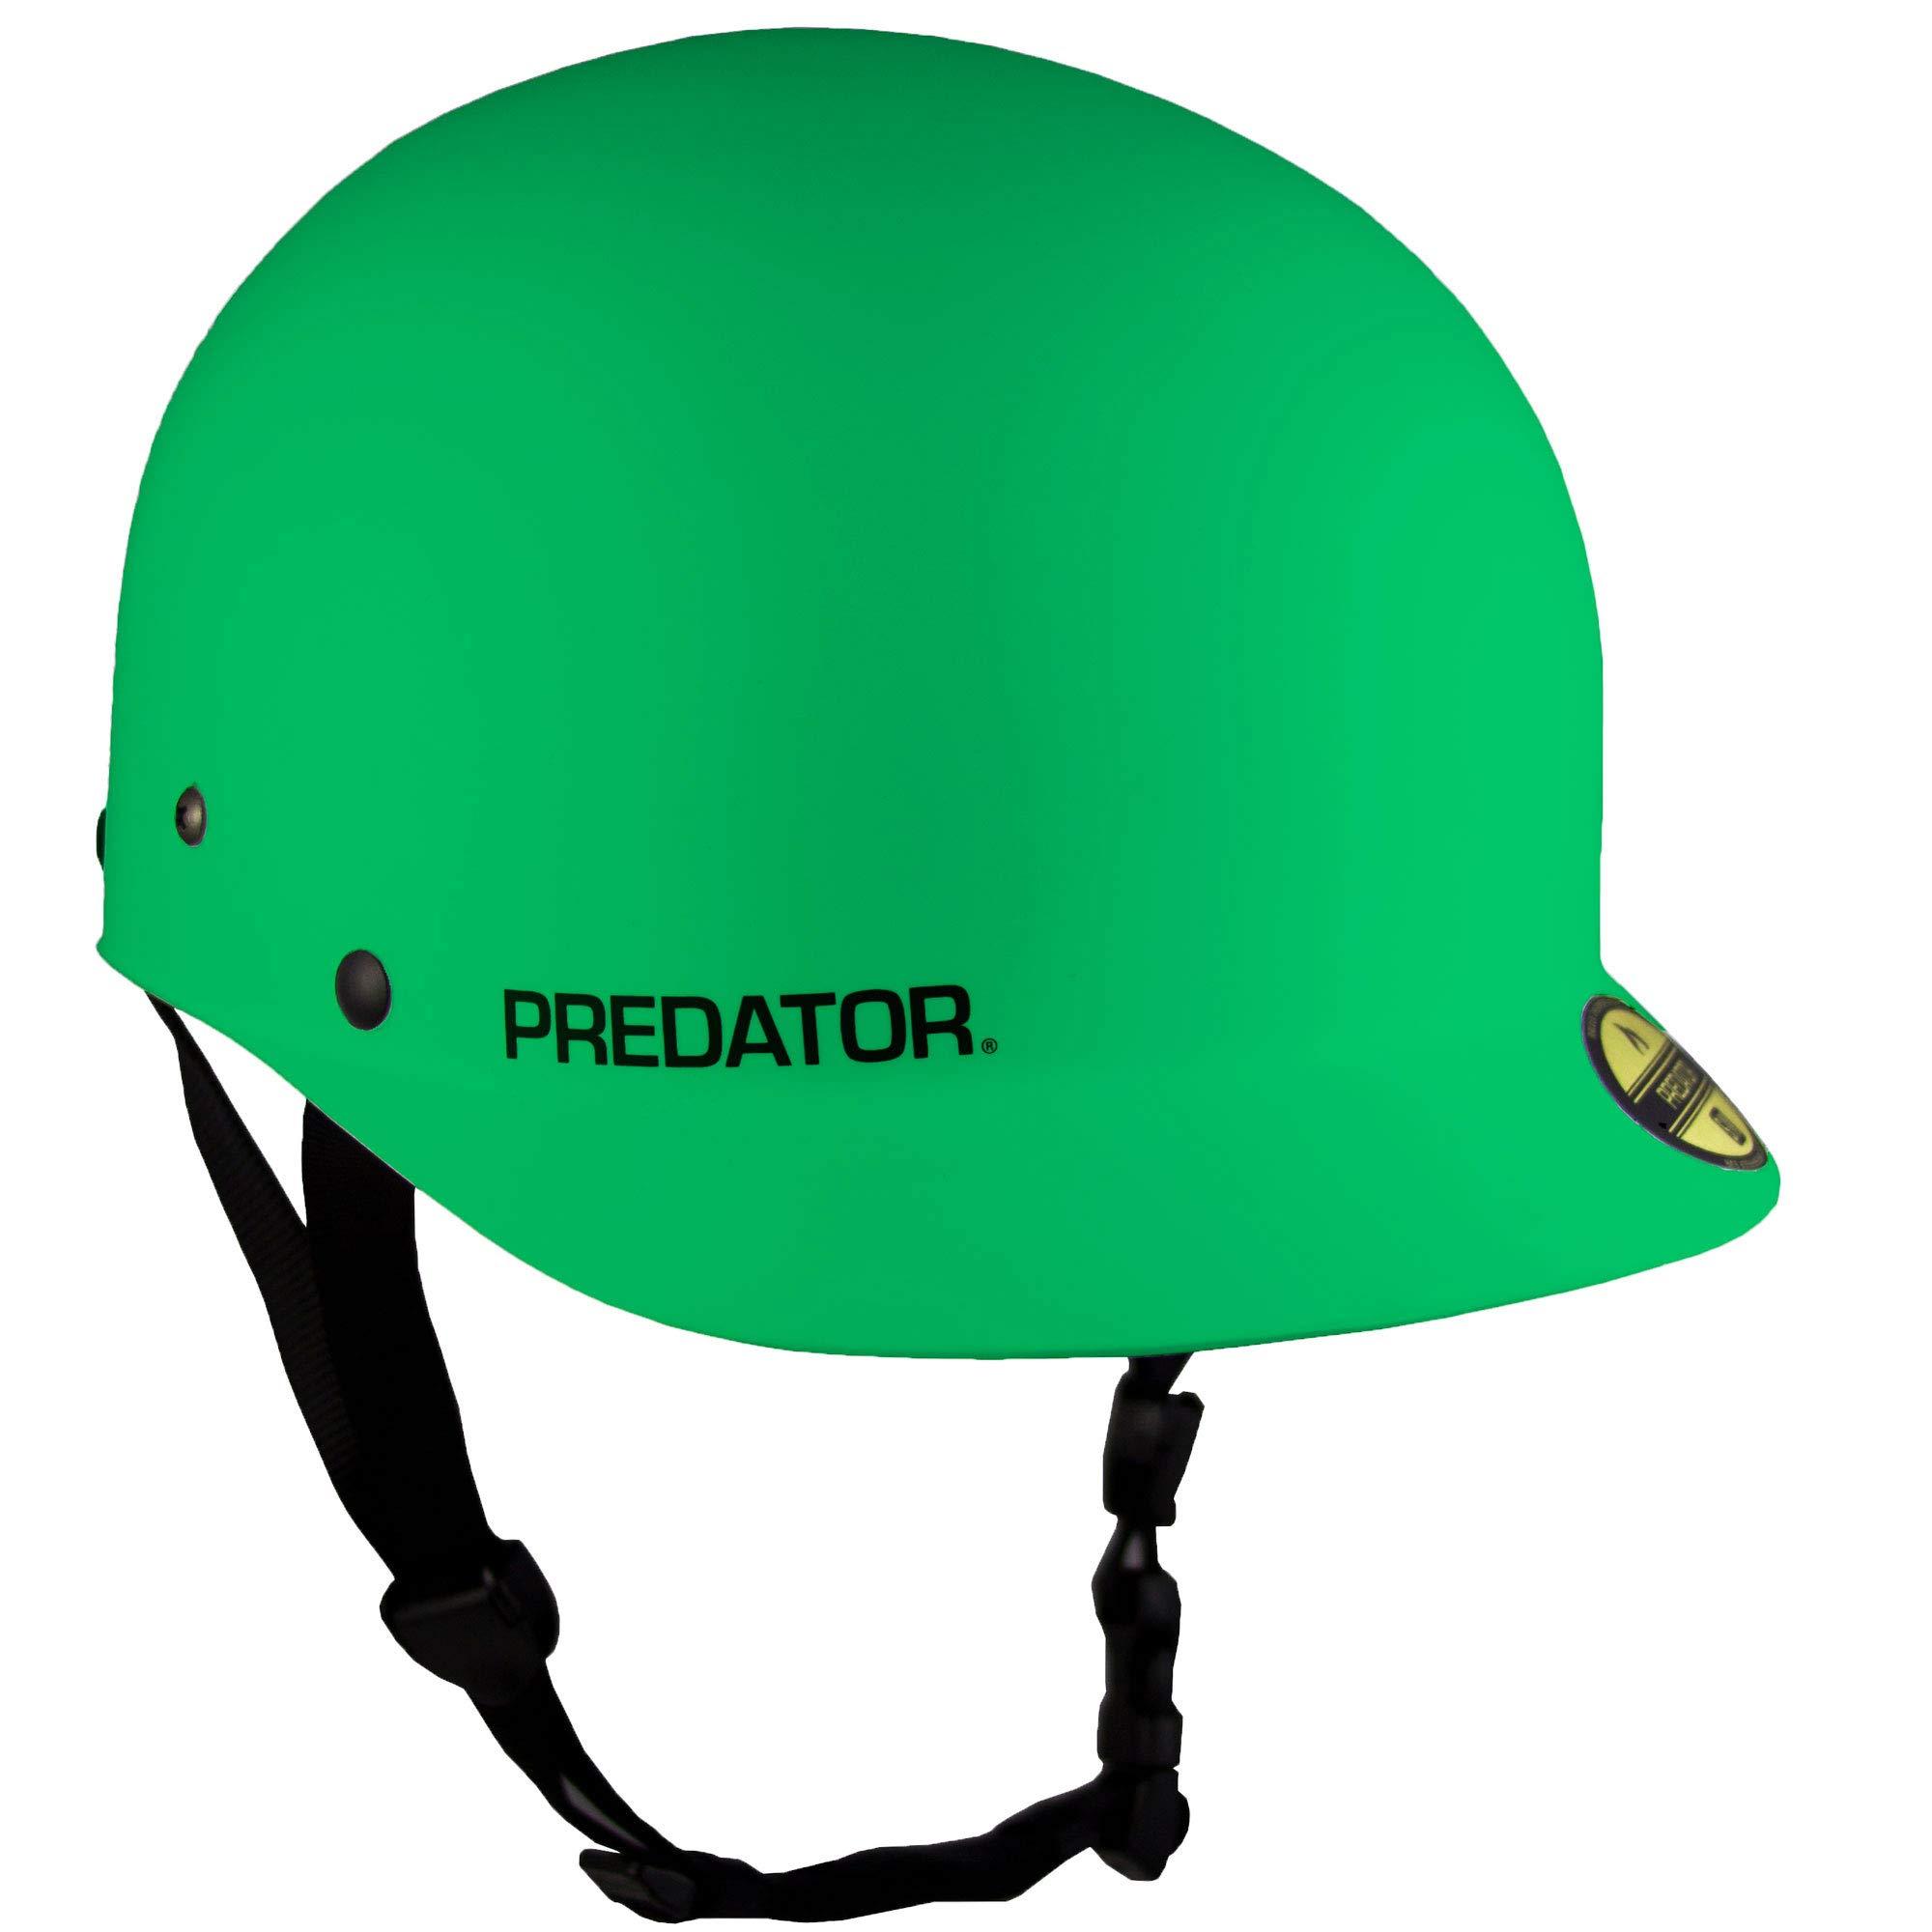 Predator Shiznit Kayak Helmet-MatteGreen-L/XL by Predator